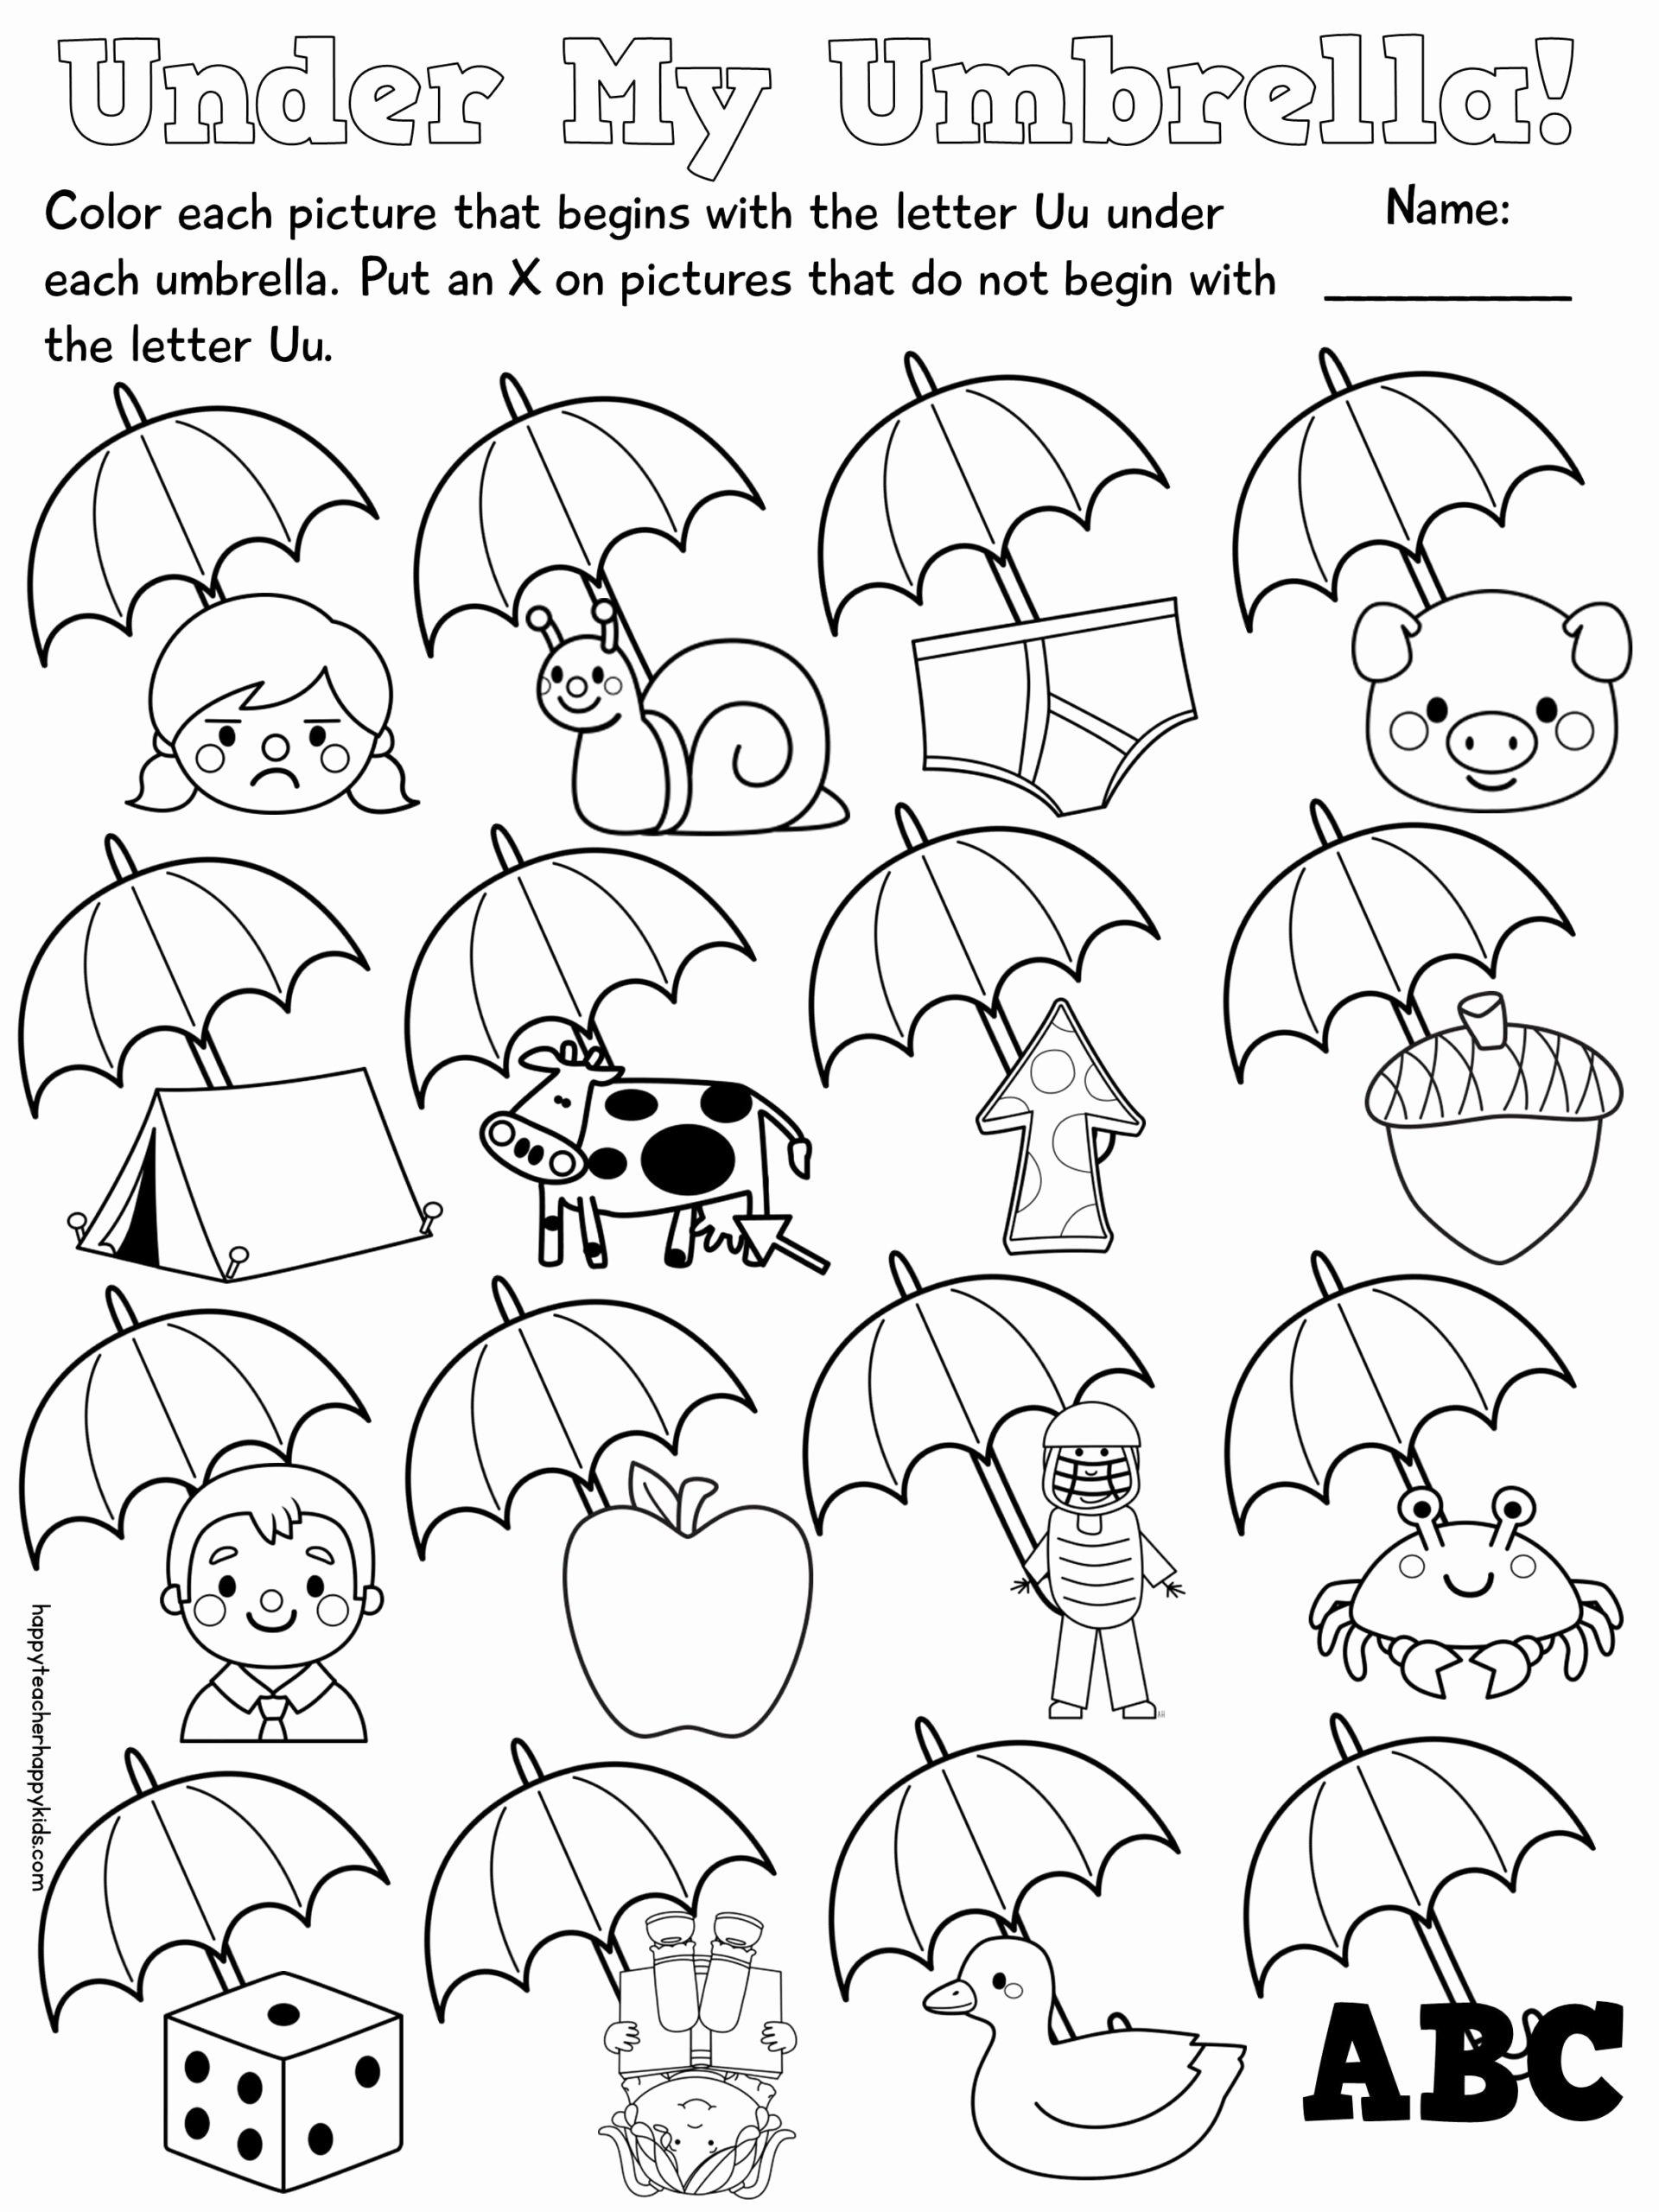 Jolly Phonics Worksheets for Preschoolers Unique Worksheets Letter Kindergarten Fun Jolly Phonics